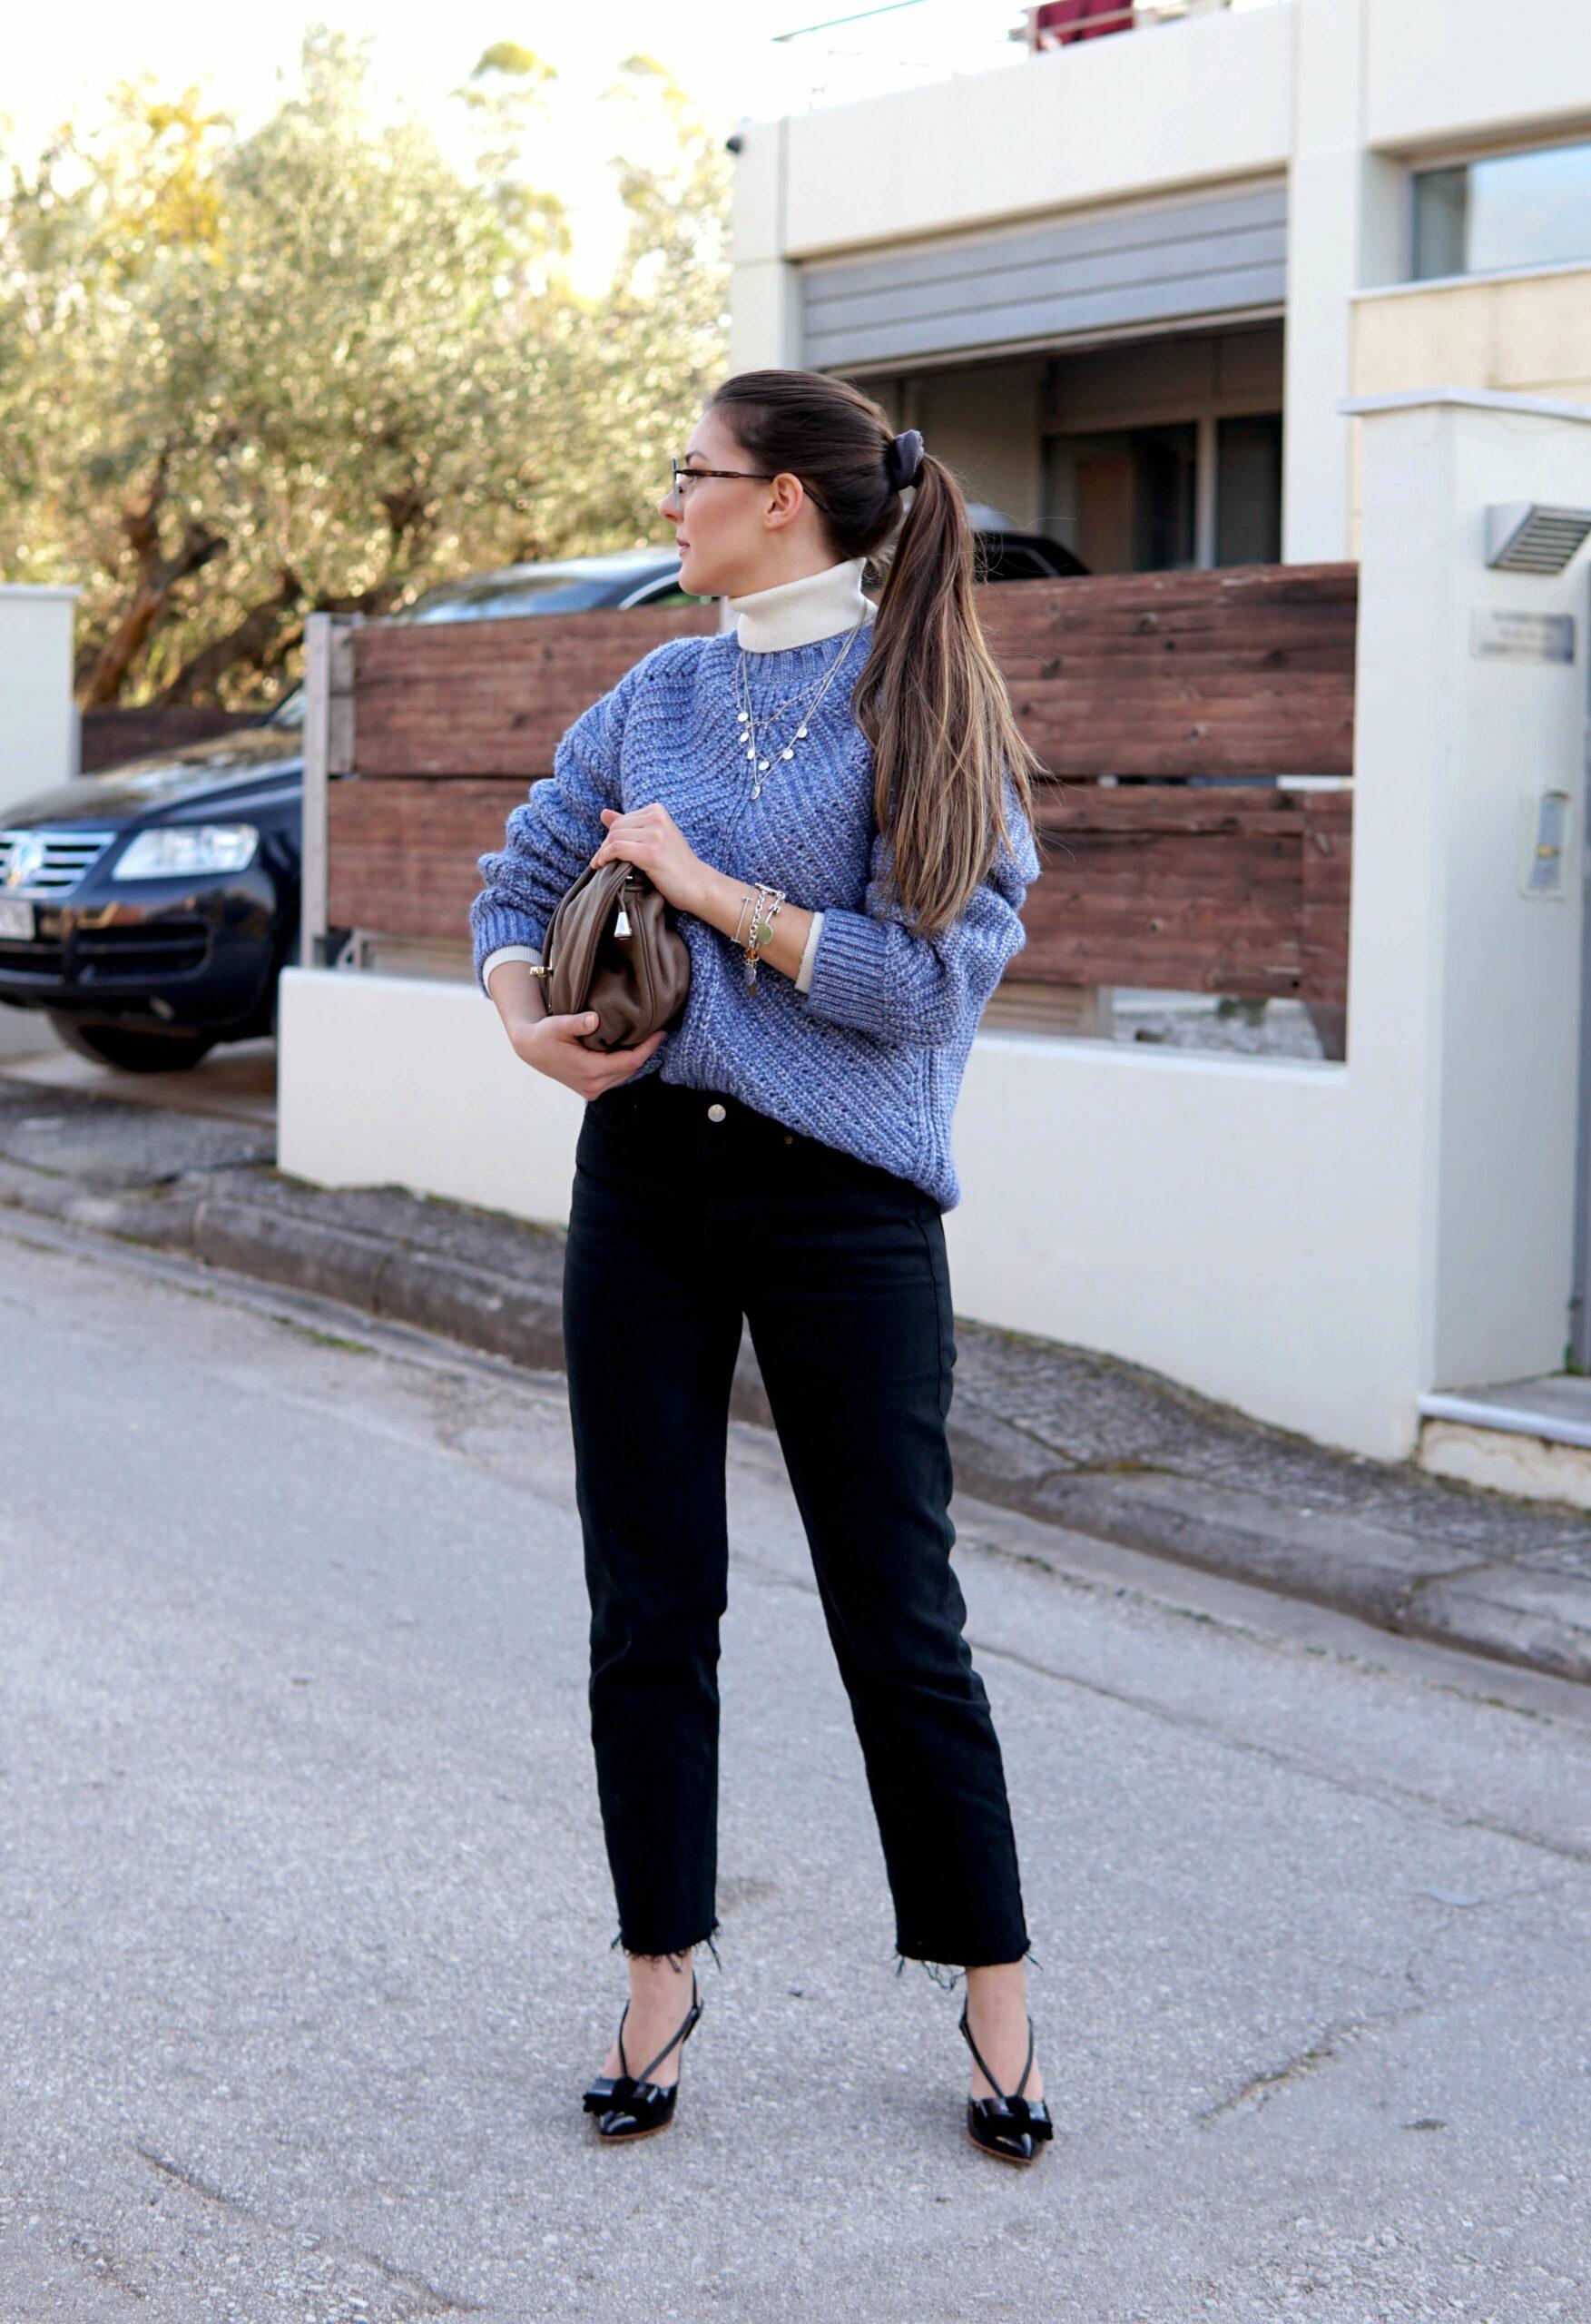 kitten heels outfit